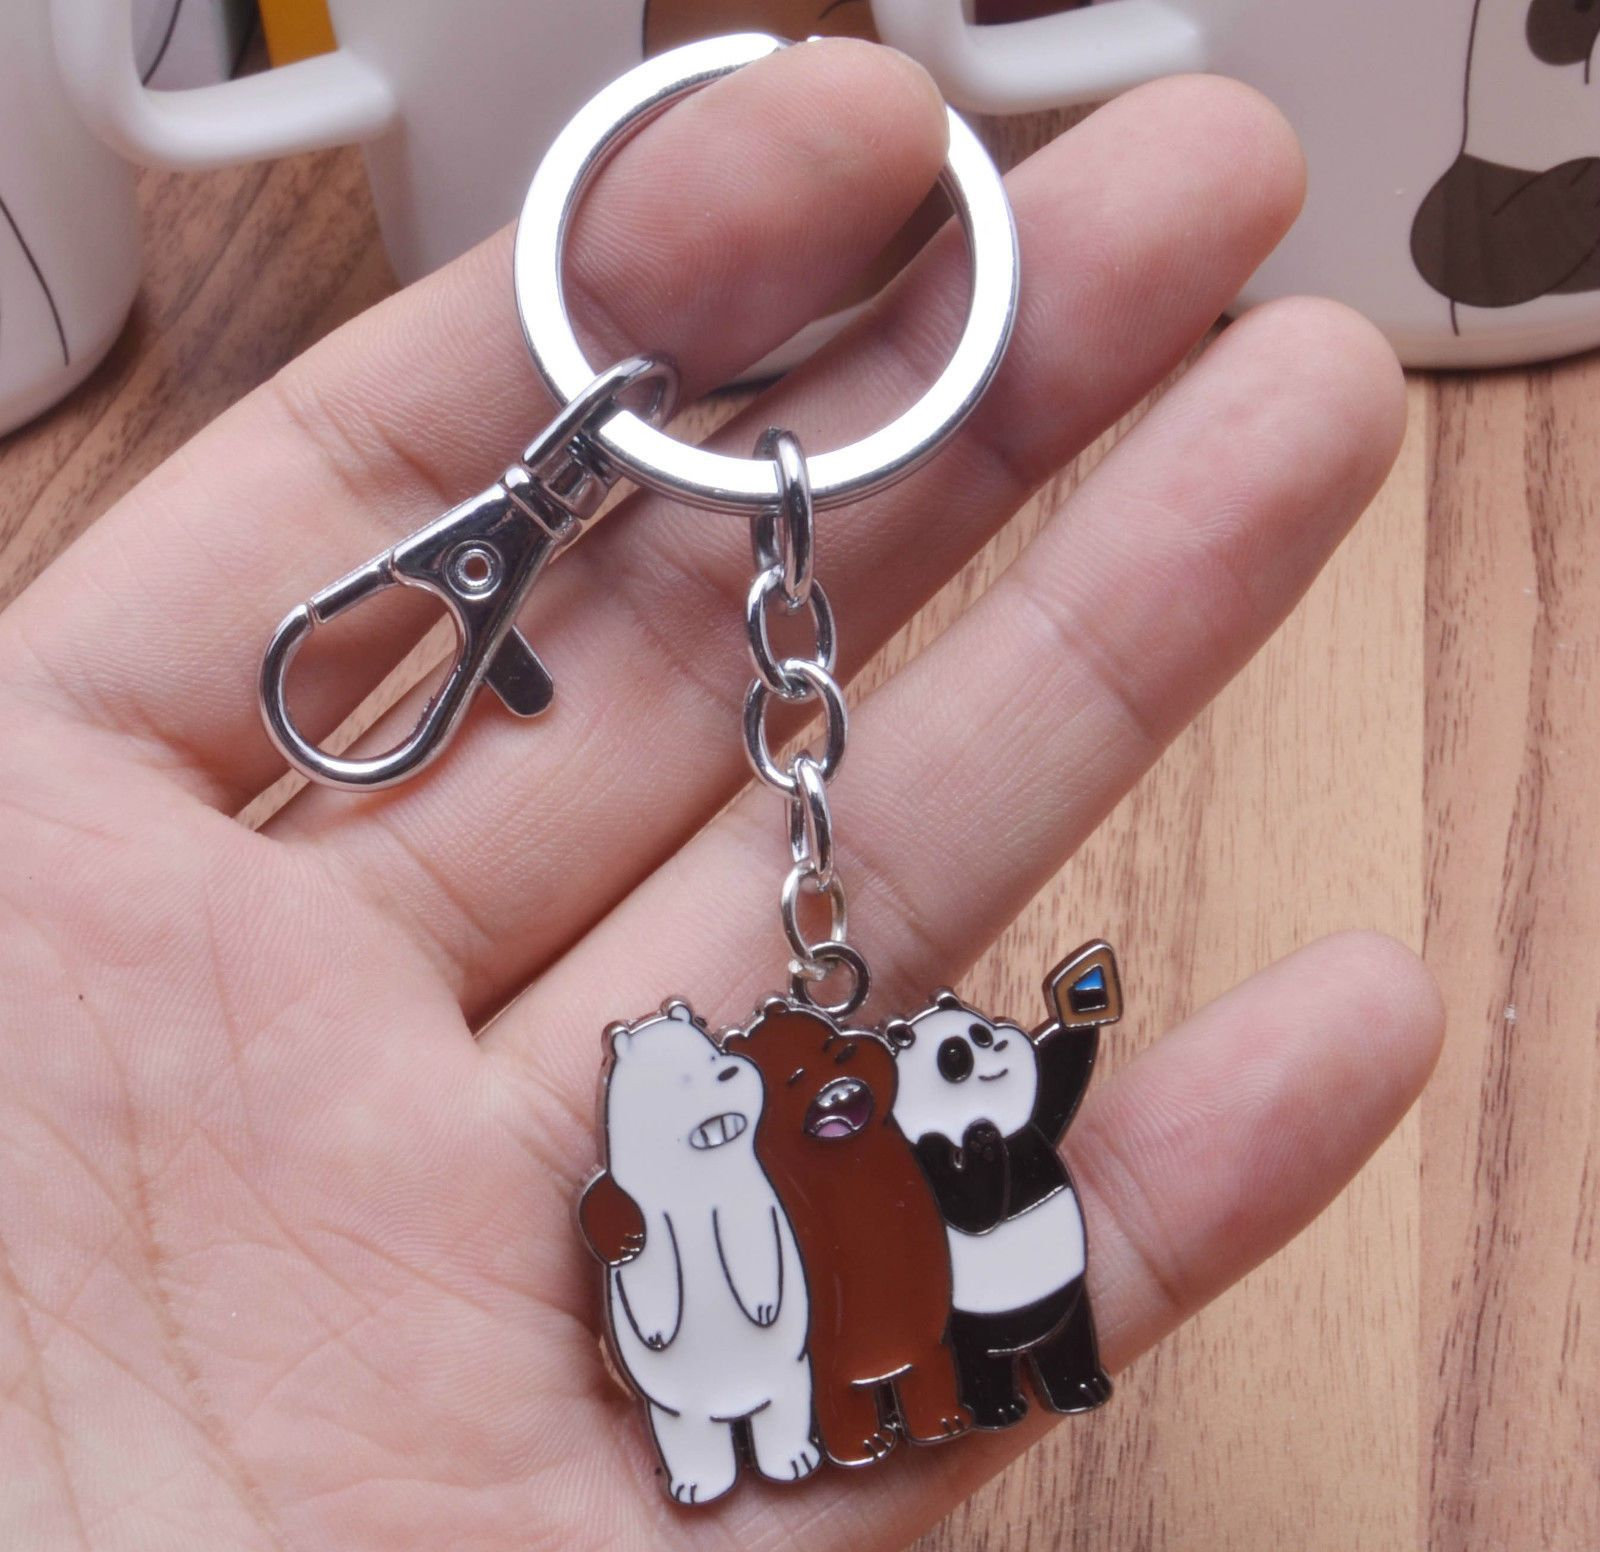 We Bare Bears Keyrings Ice Bear Key Chain Lanyard Bag Pendants Ornaments Collect